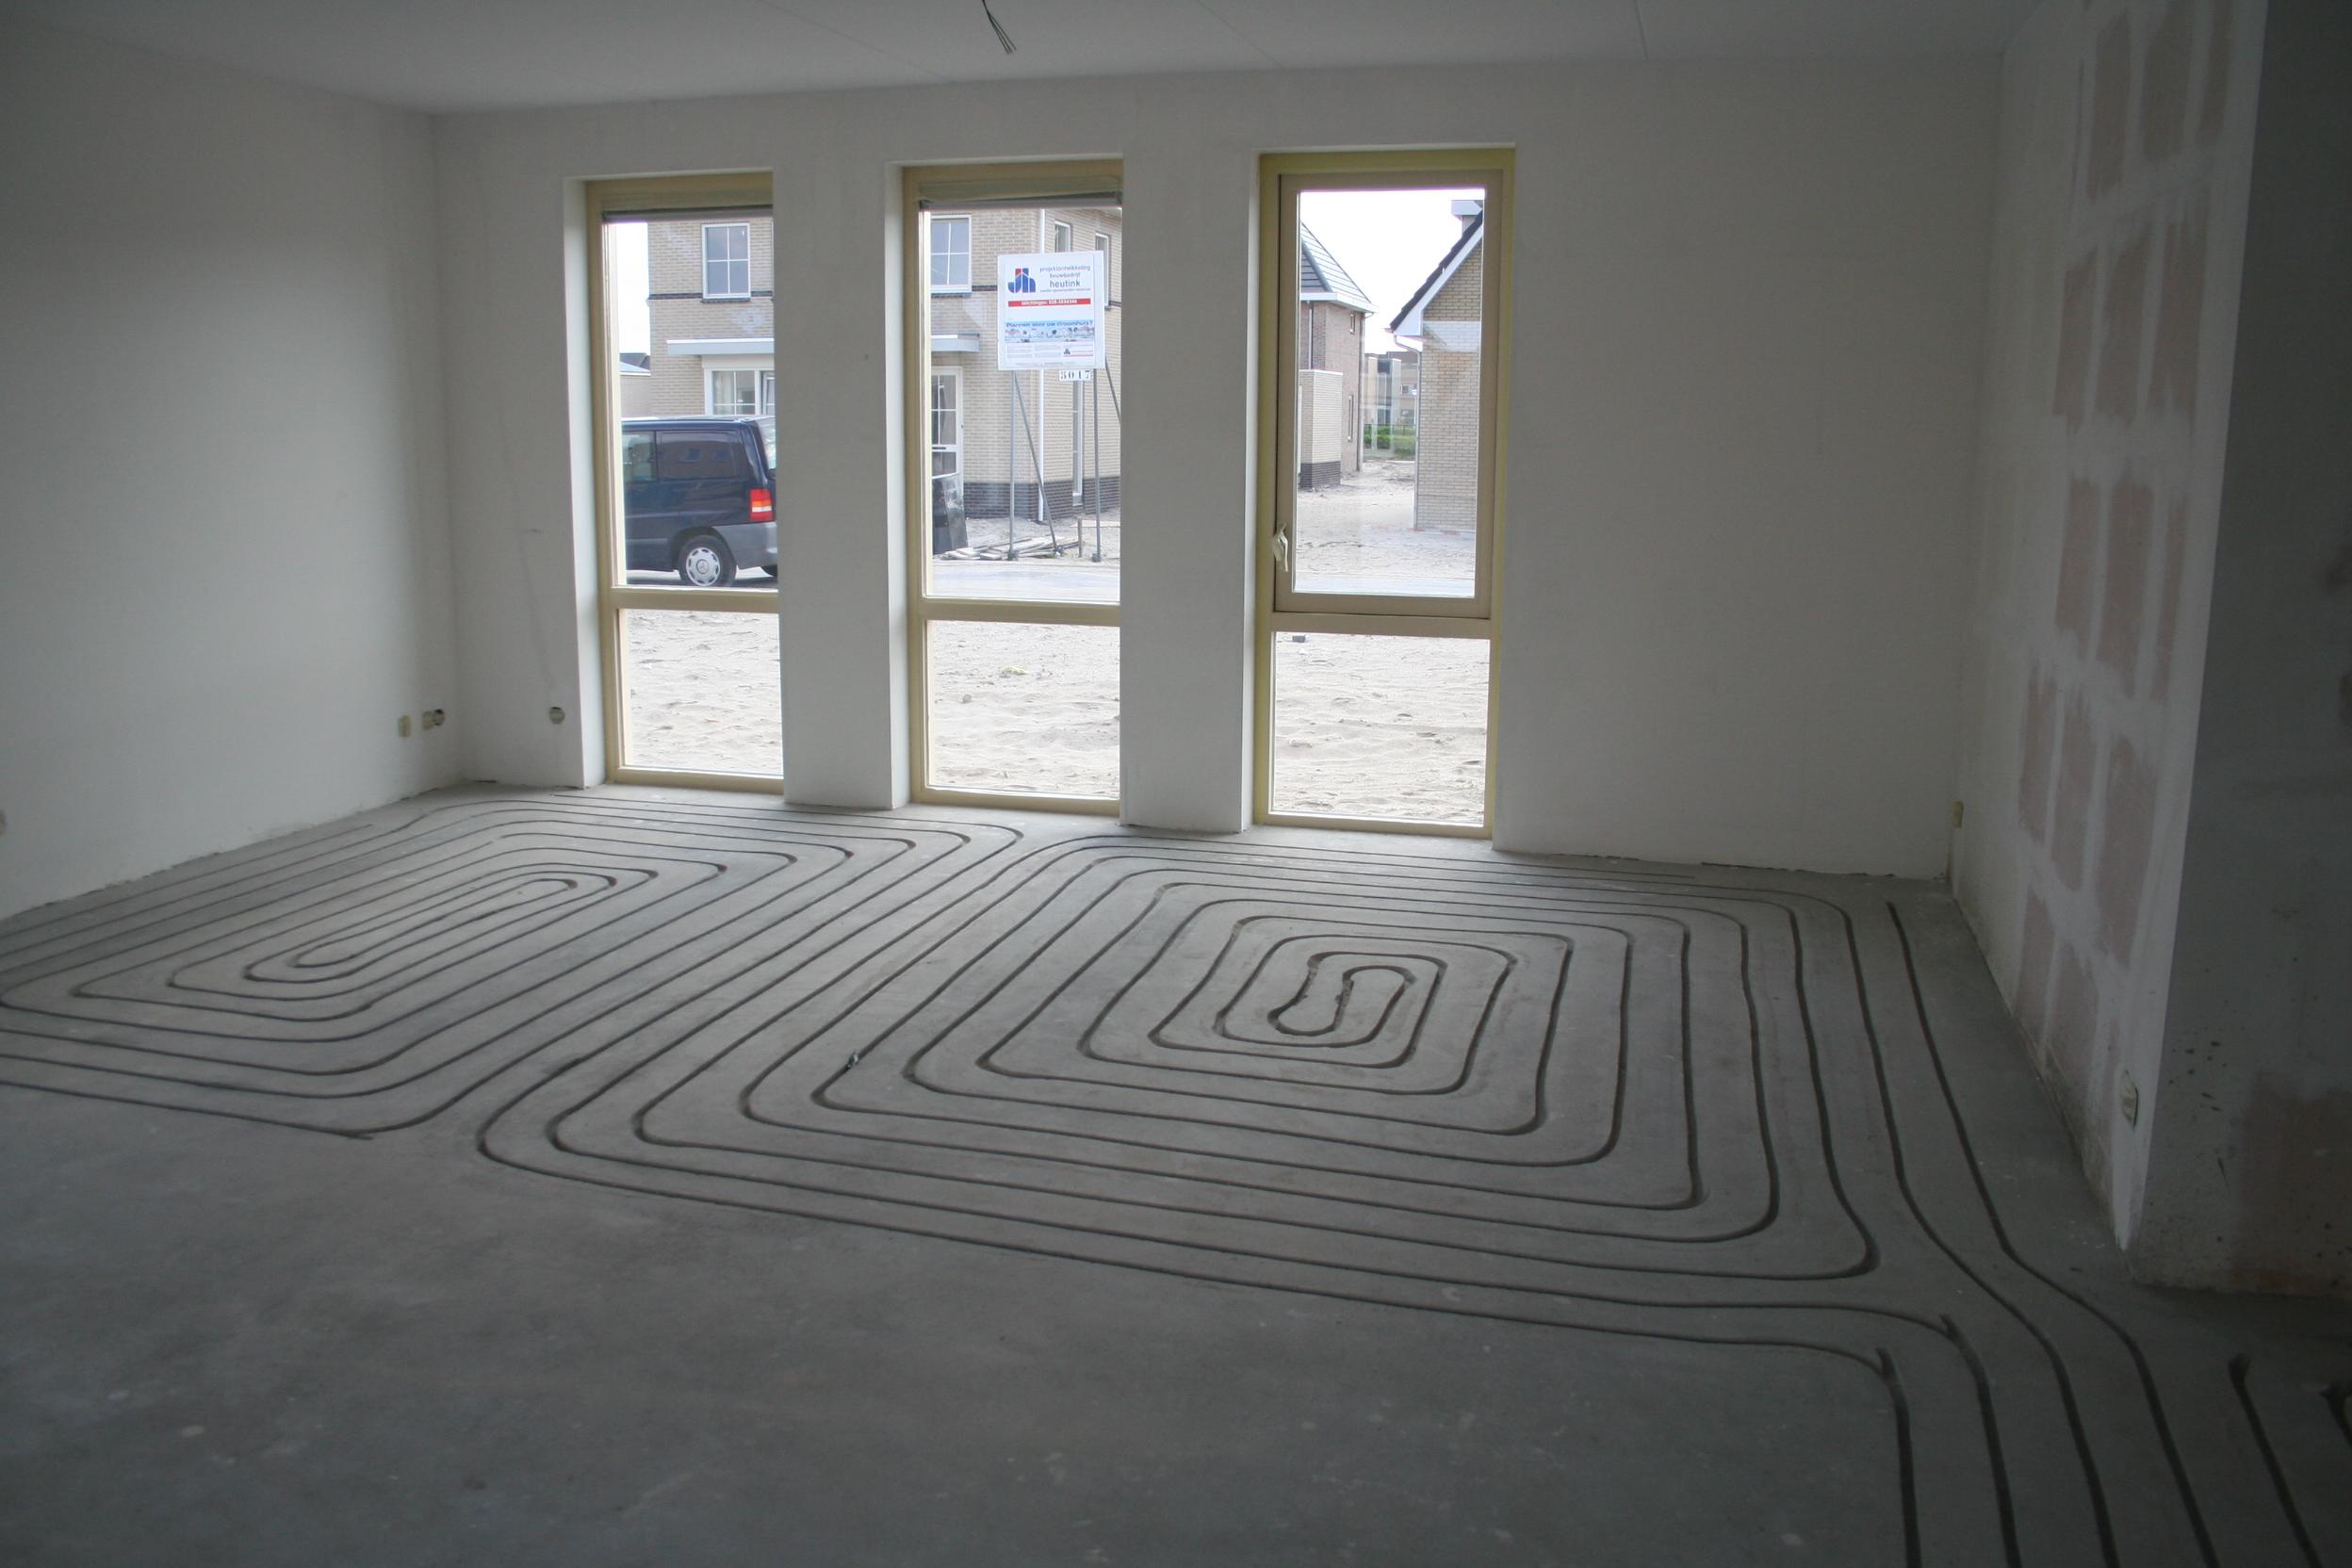 vloerverwarming prijs.nl -